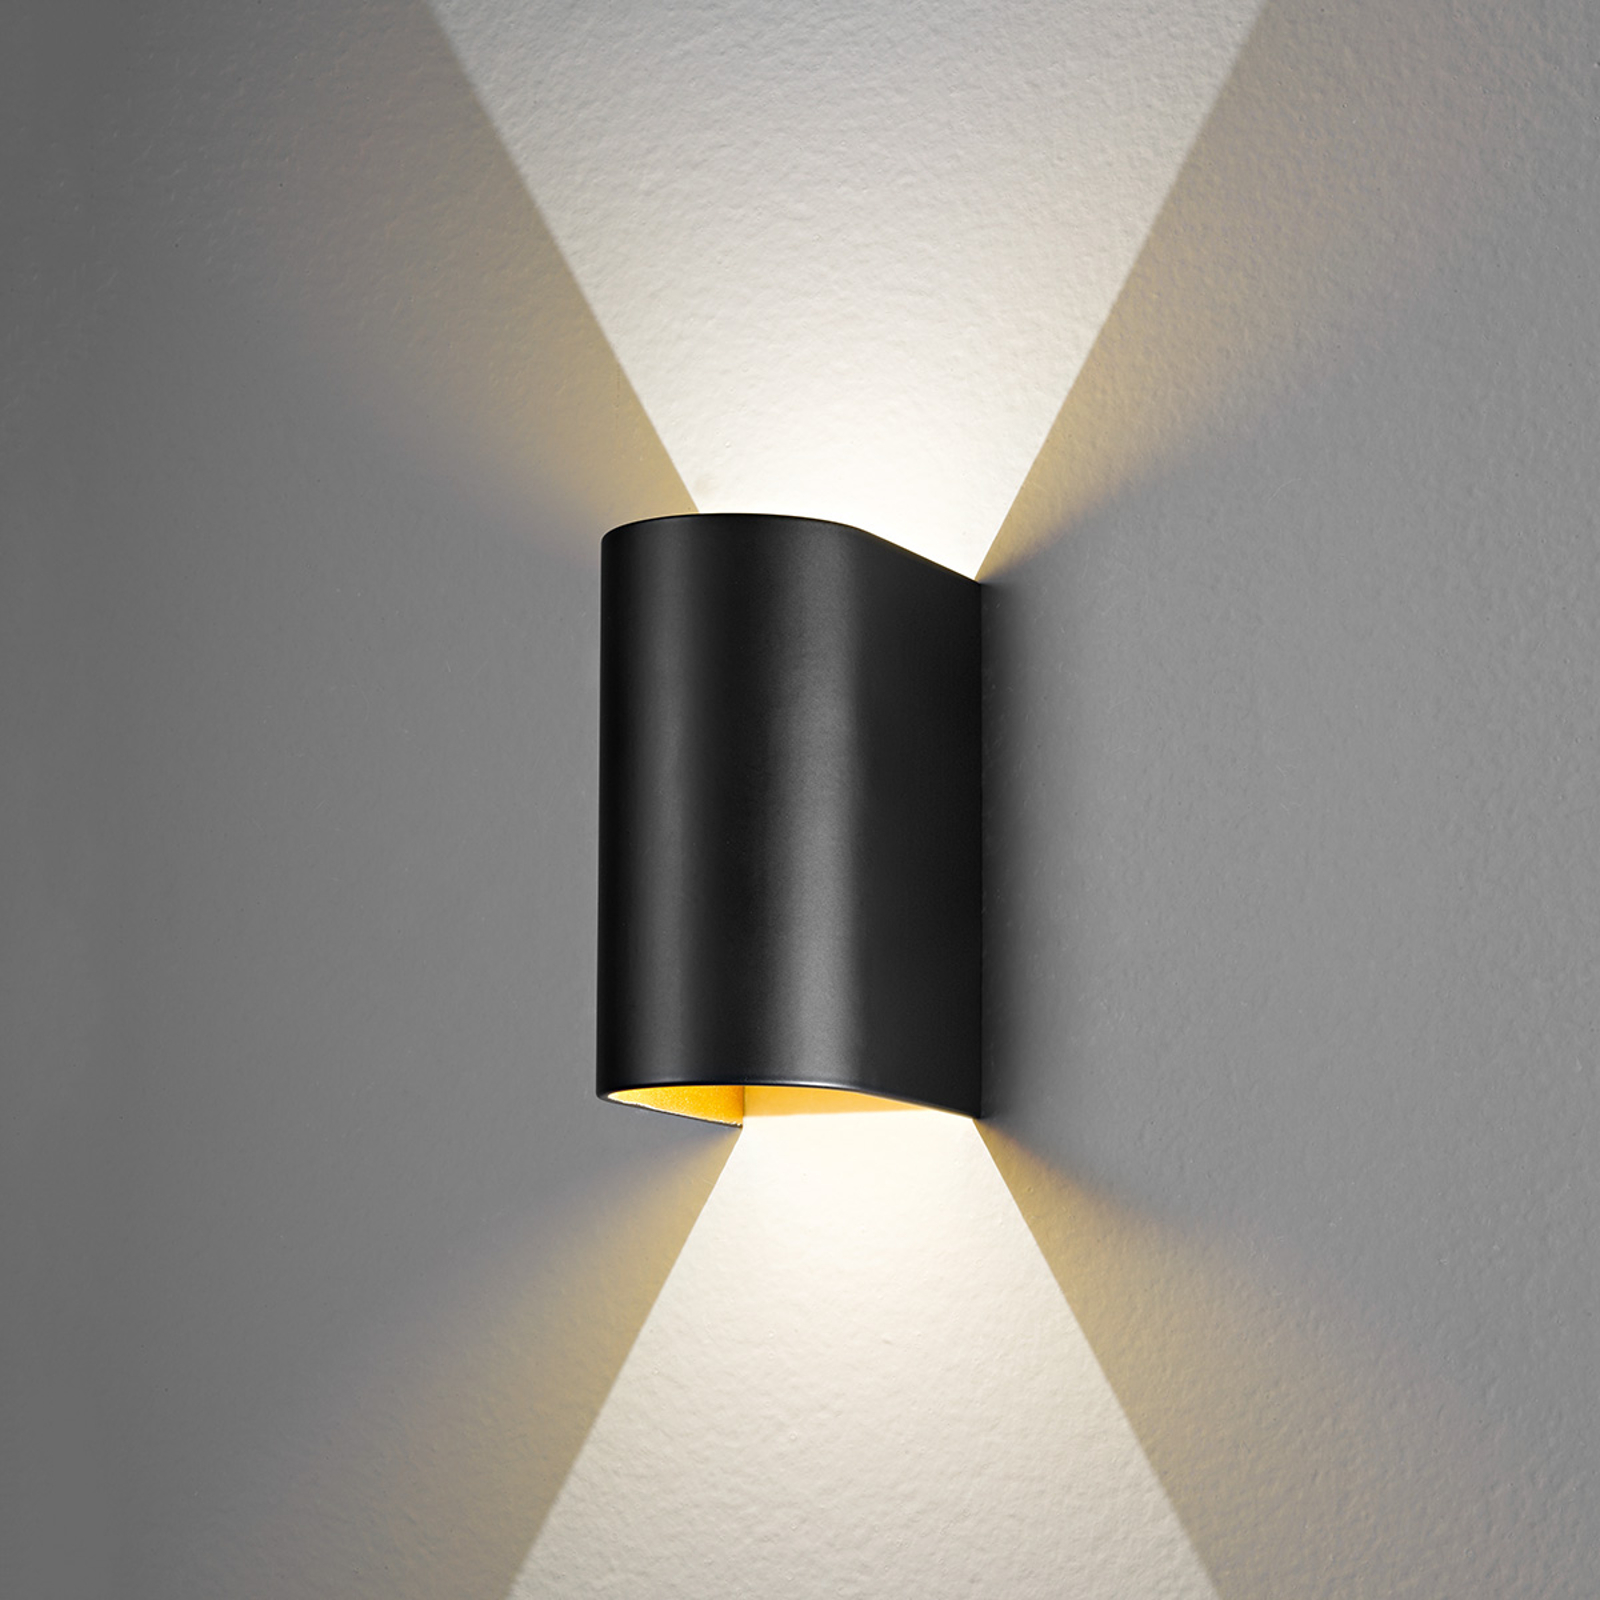 Applique LED Feeling, dorata-nera